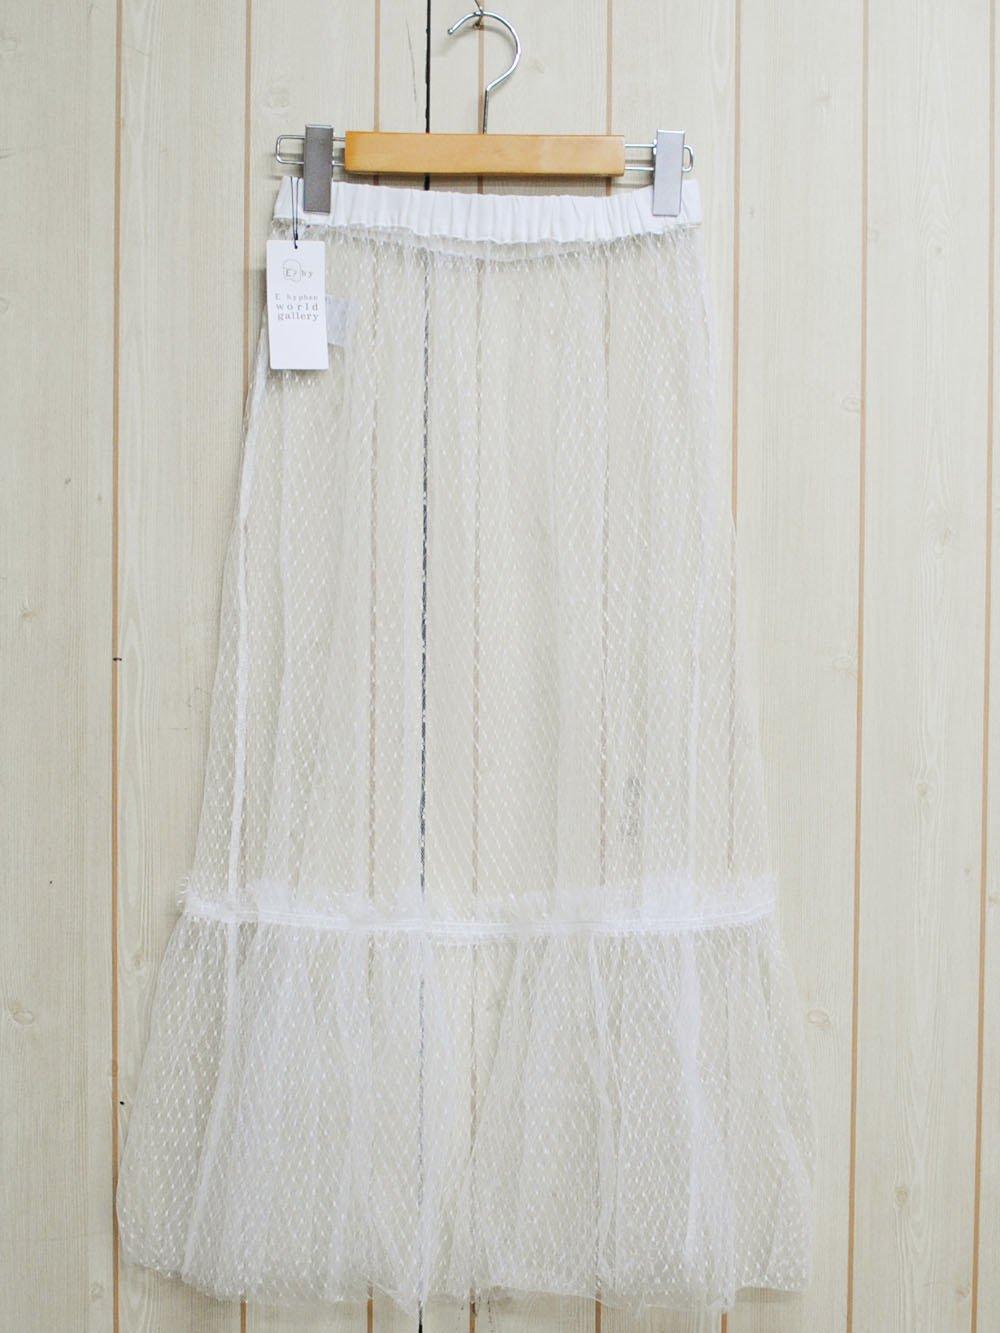 【96%OFF】@129円■20枚セット■網チュールスカート※チラシ&POP NG商品